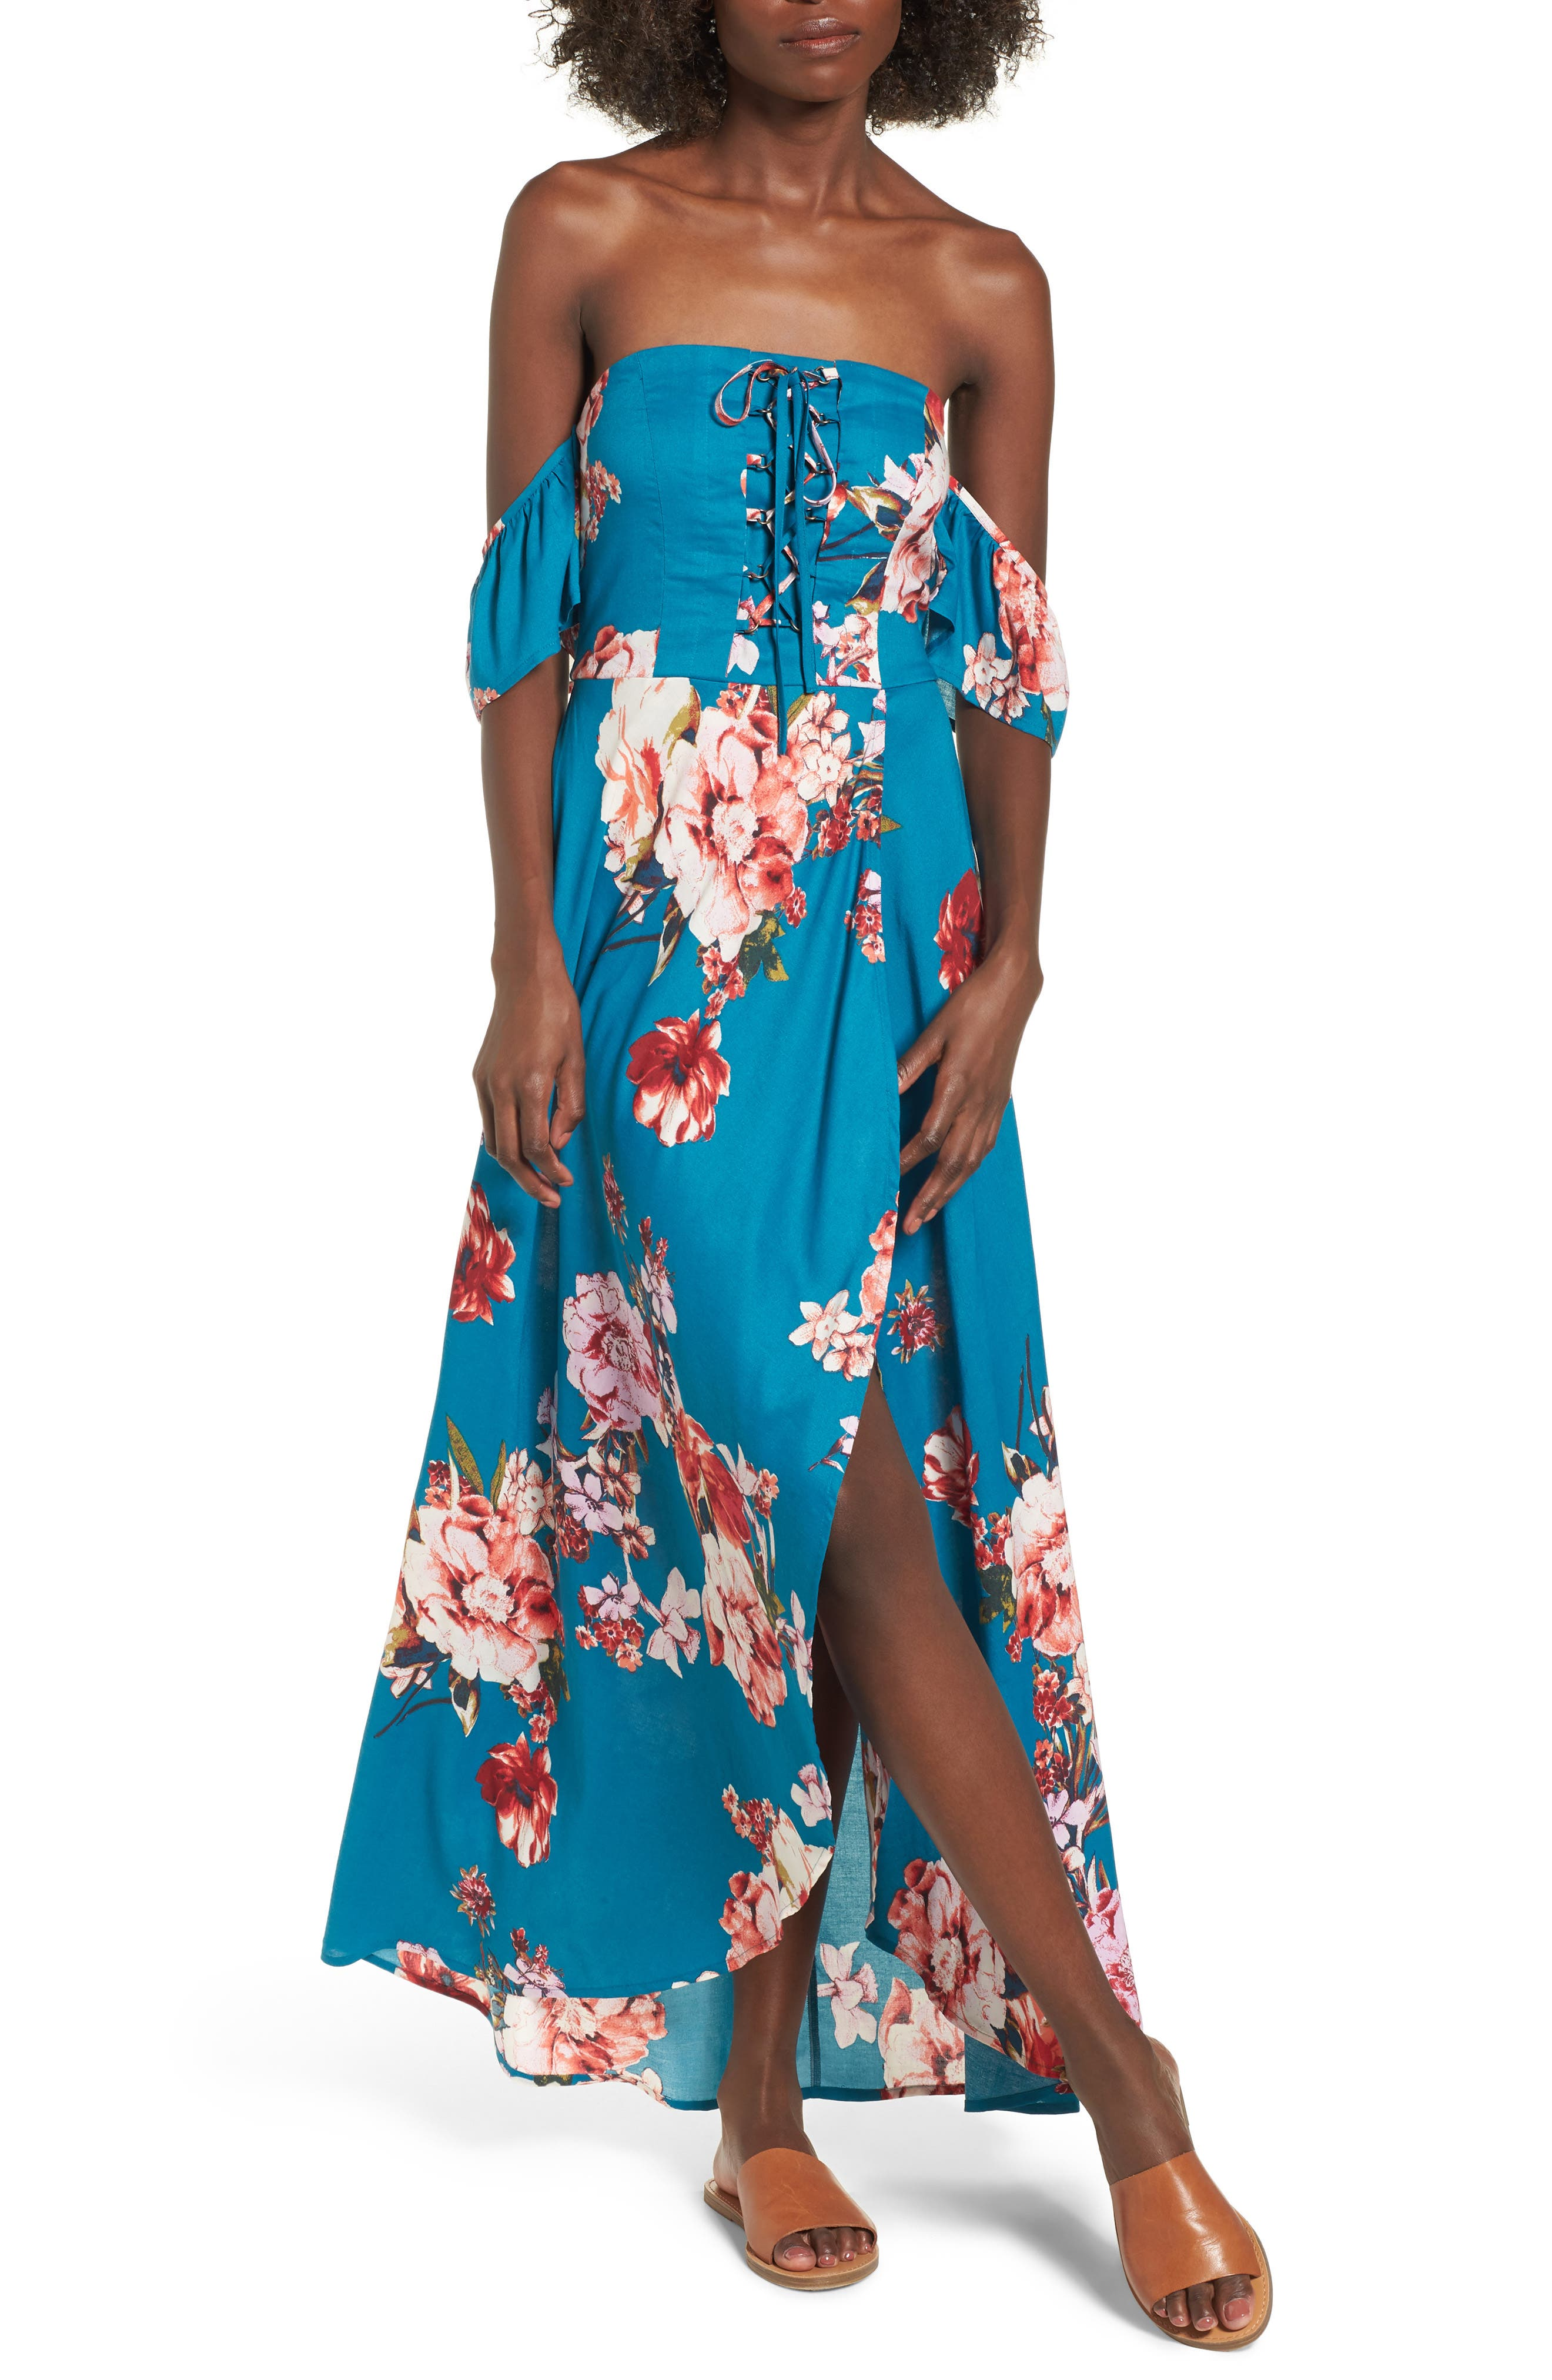 Lace Up Cold Shoulder Maxi Dress,                             Main thumbnail 1, color,                             402